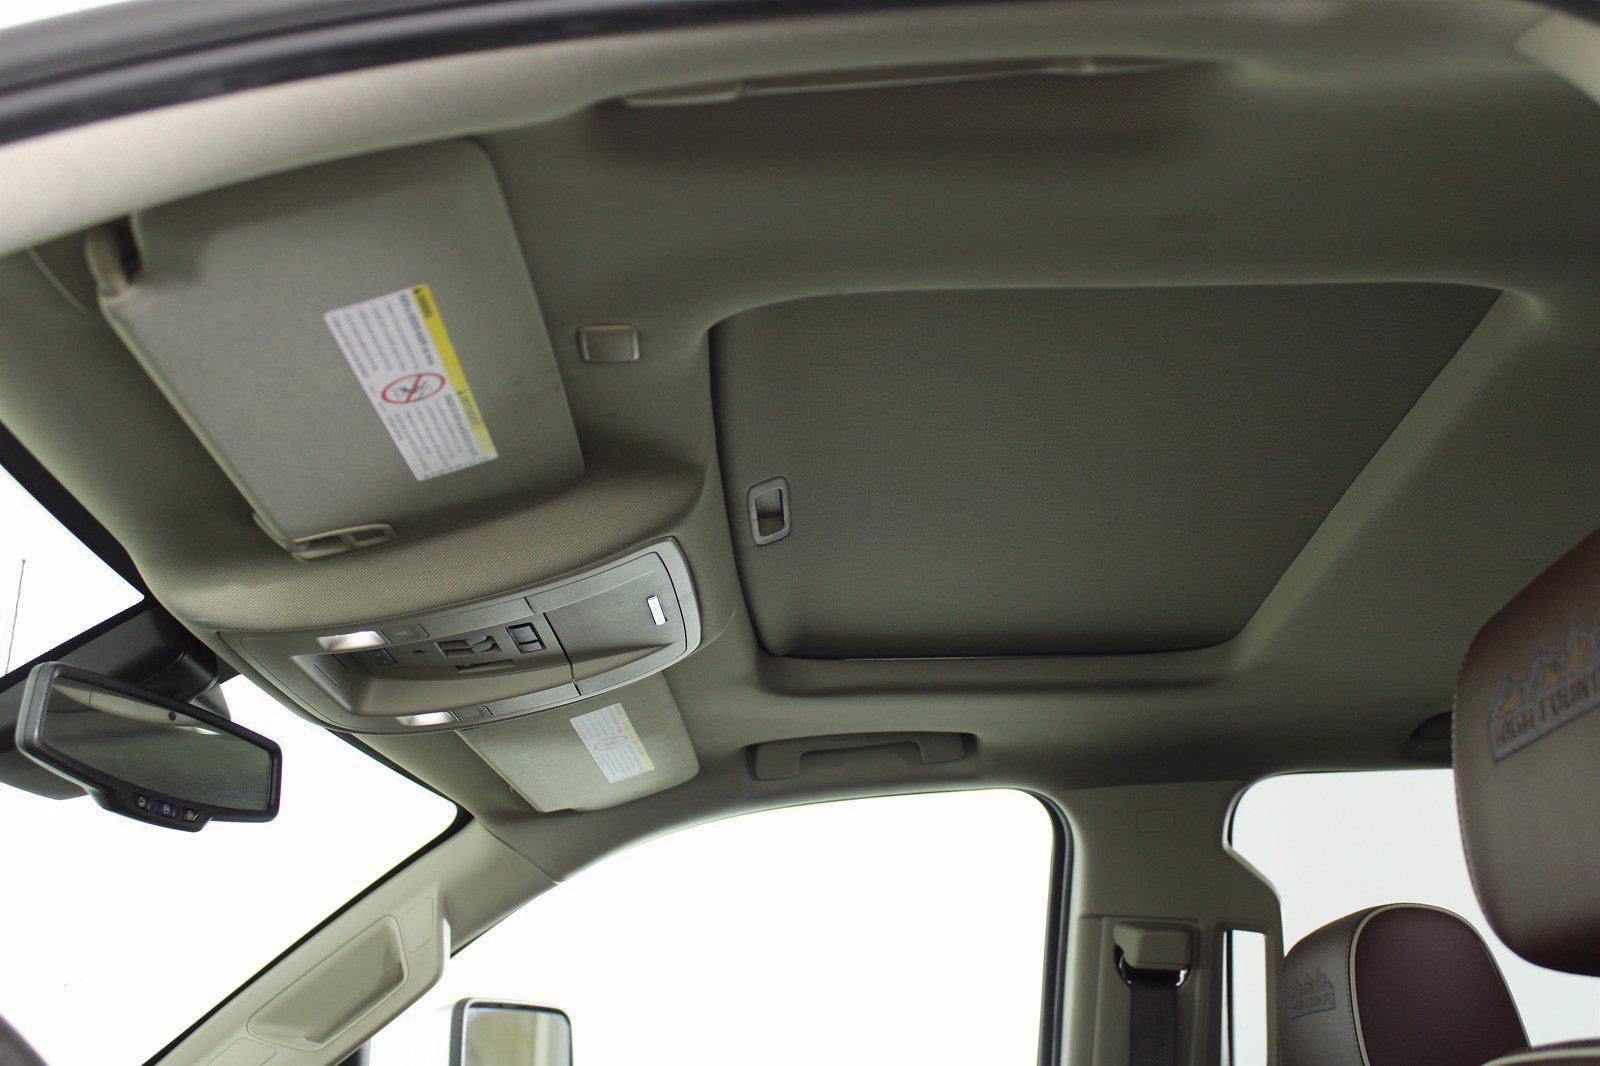 2018 Chevrolet Silverado 3500 Crew Cab 4x4, Pickup #DU90958 - photo 4